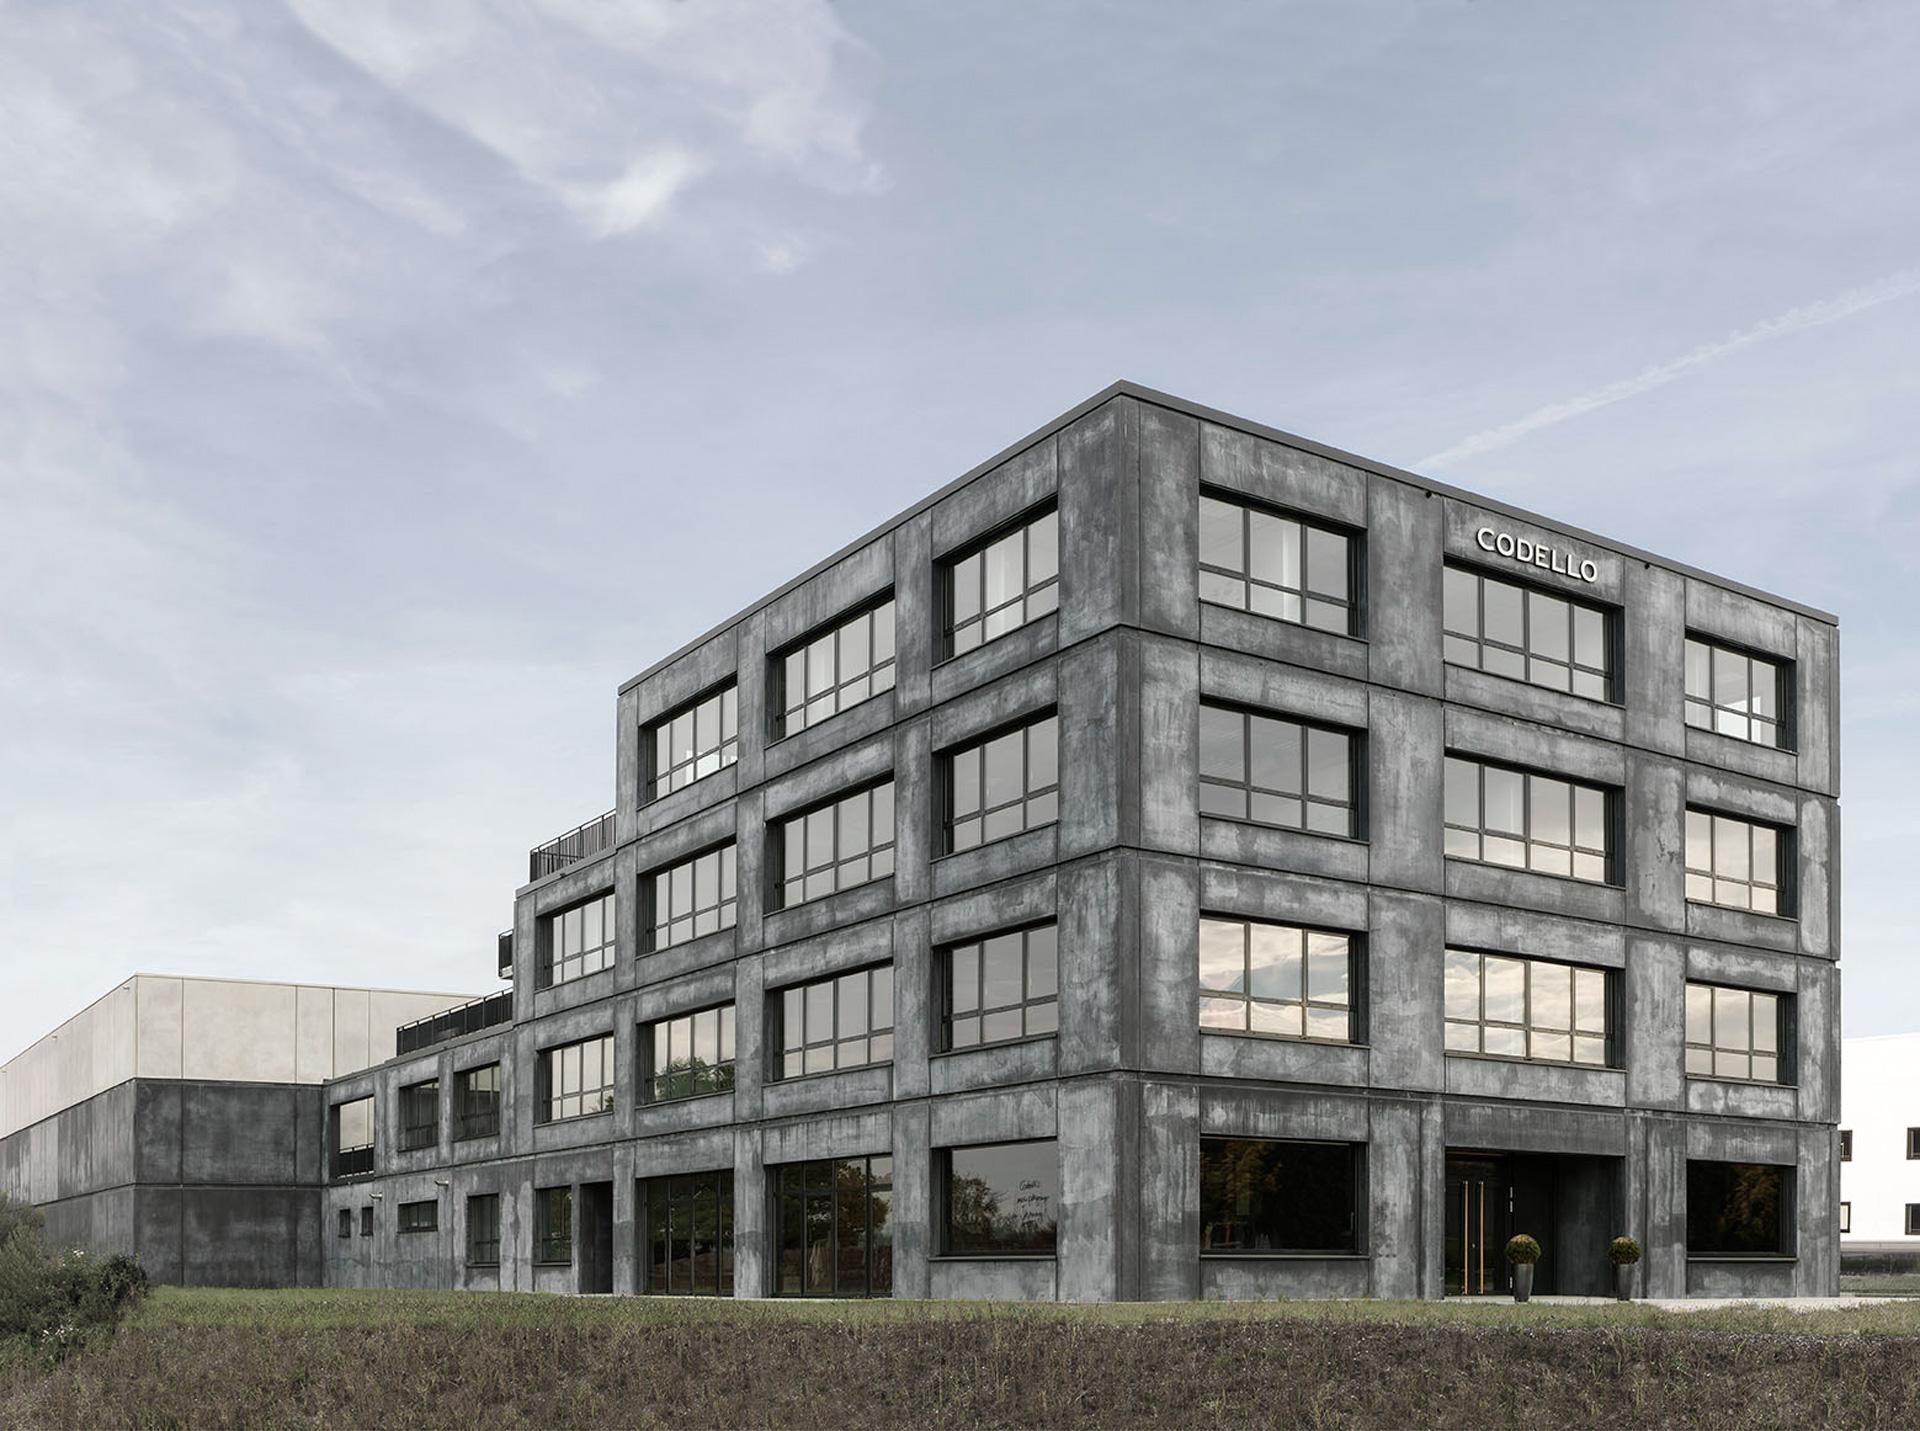 Philipp Moeller-Markenarchitektur-Neubau-Buerogebäude-Codello Campus2.jpg